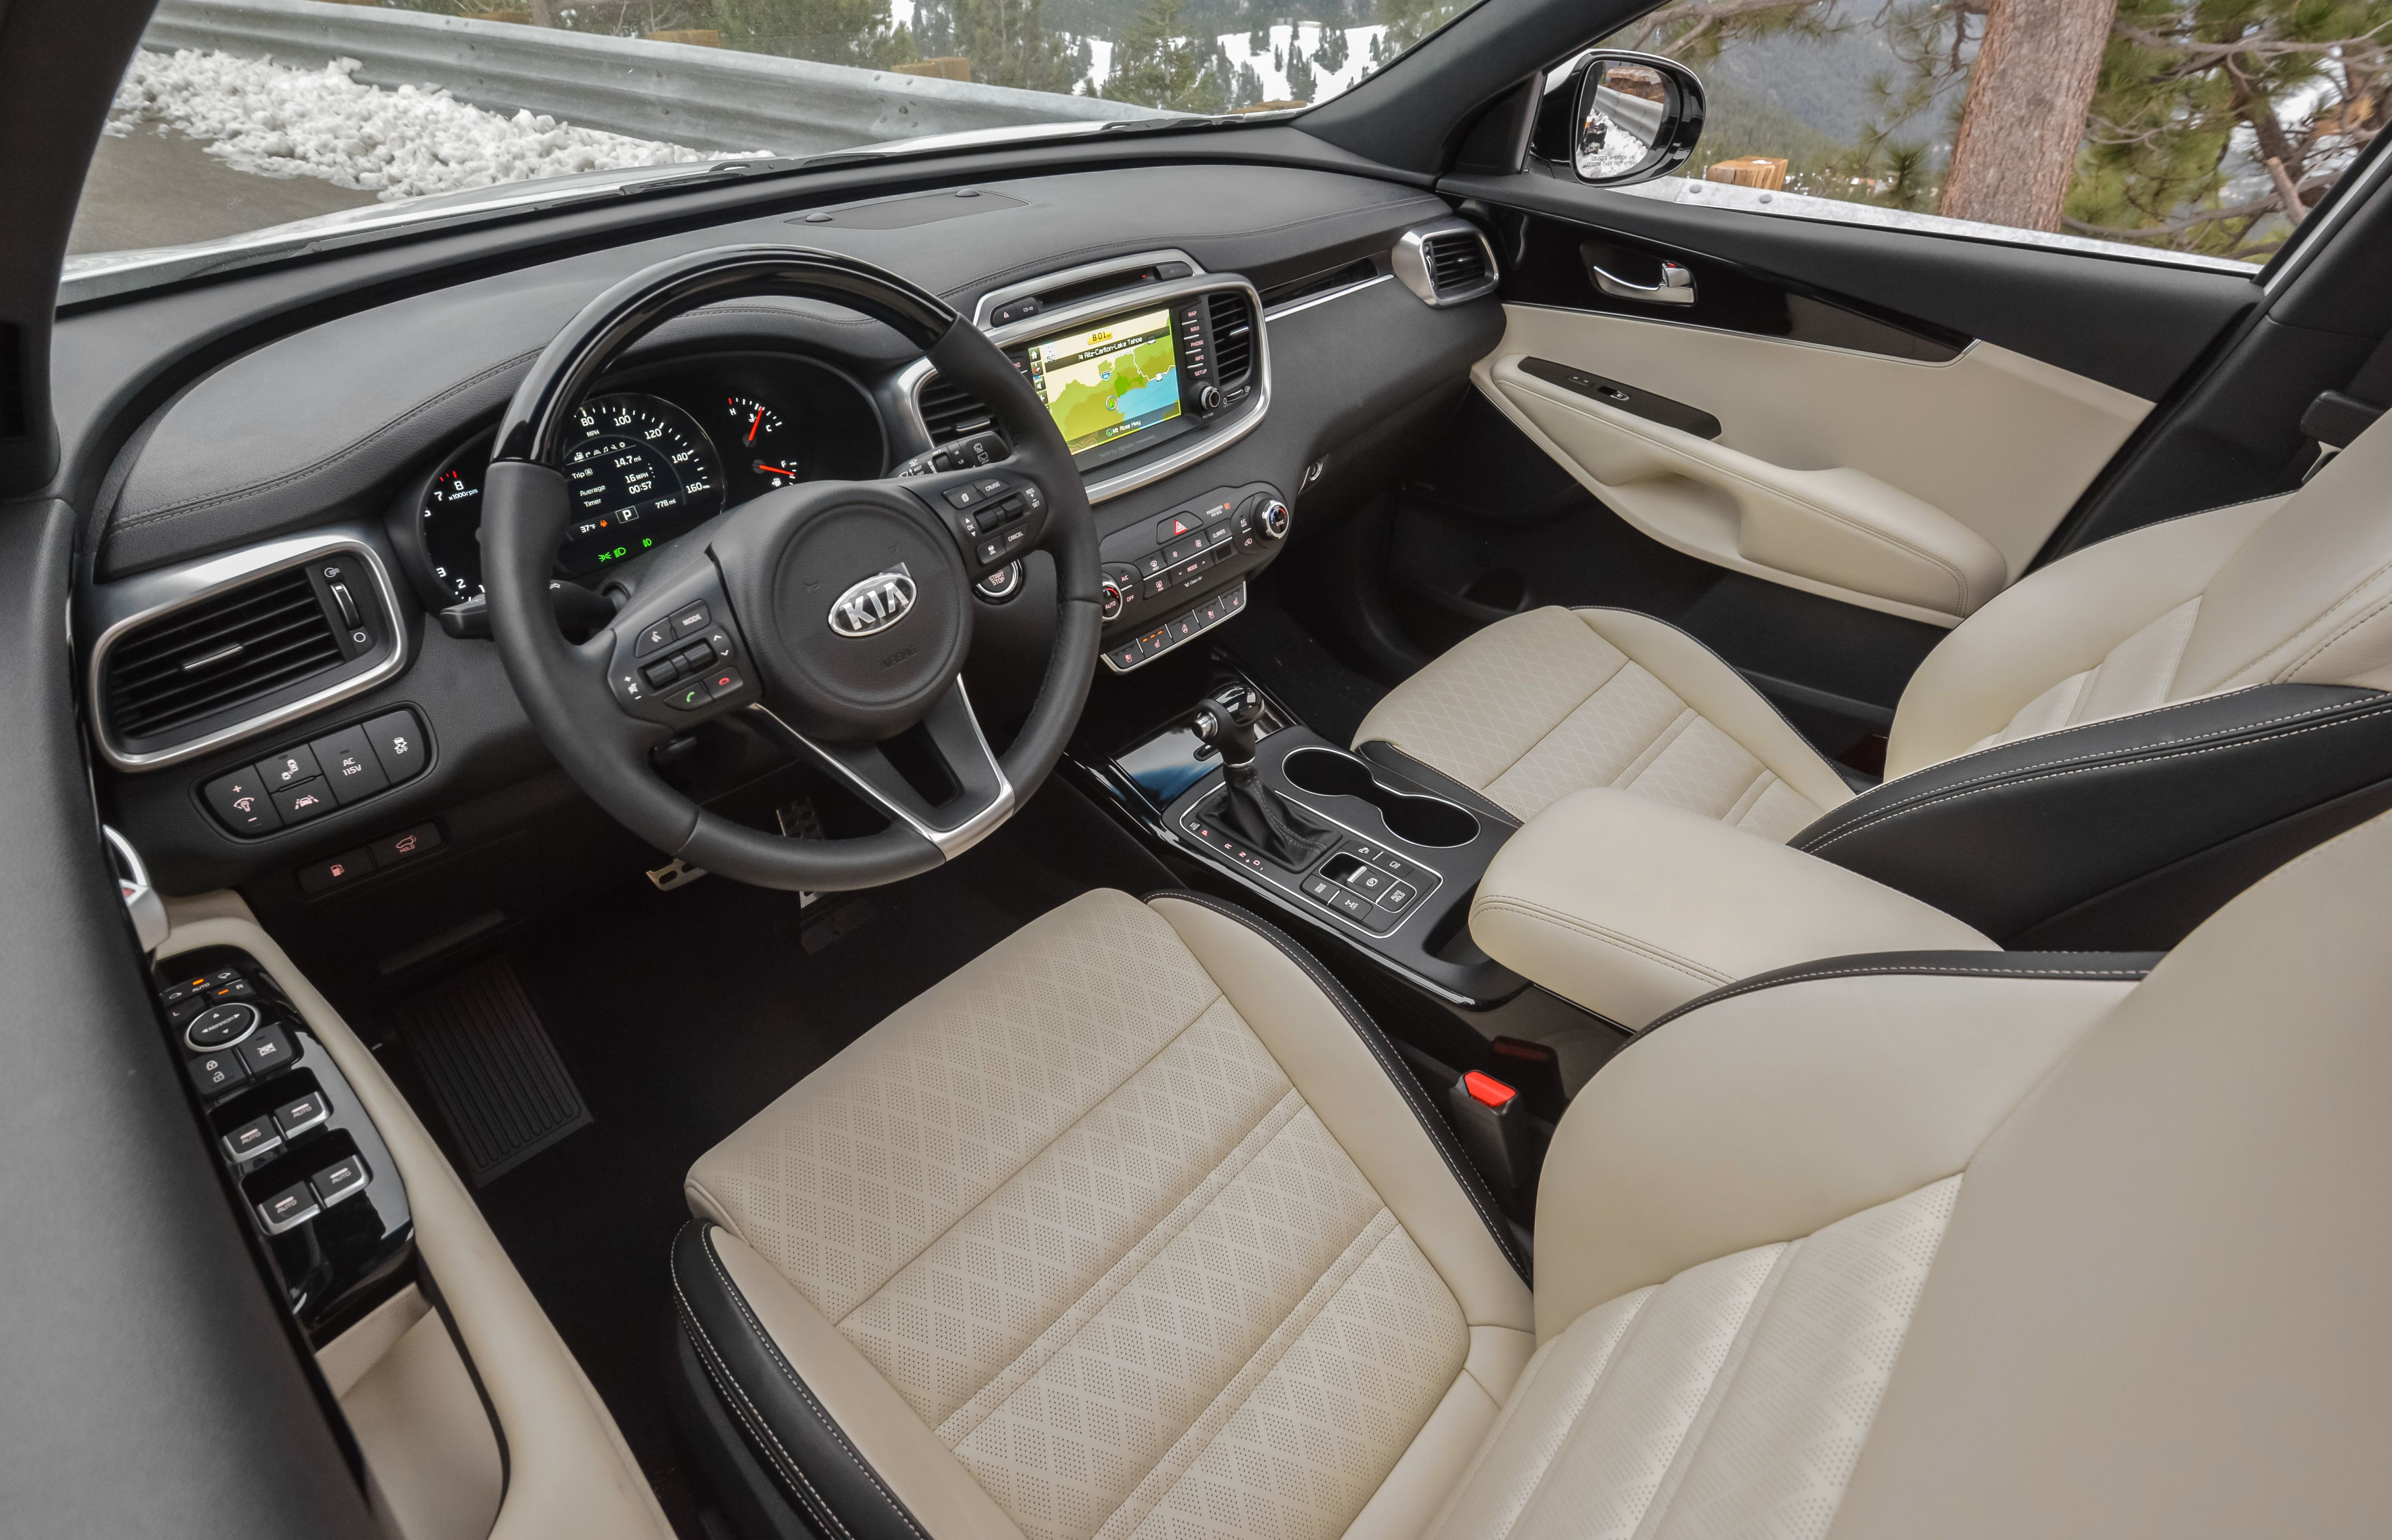 2017 Kia Sorento   Interior